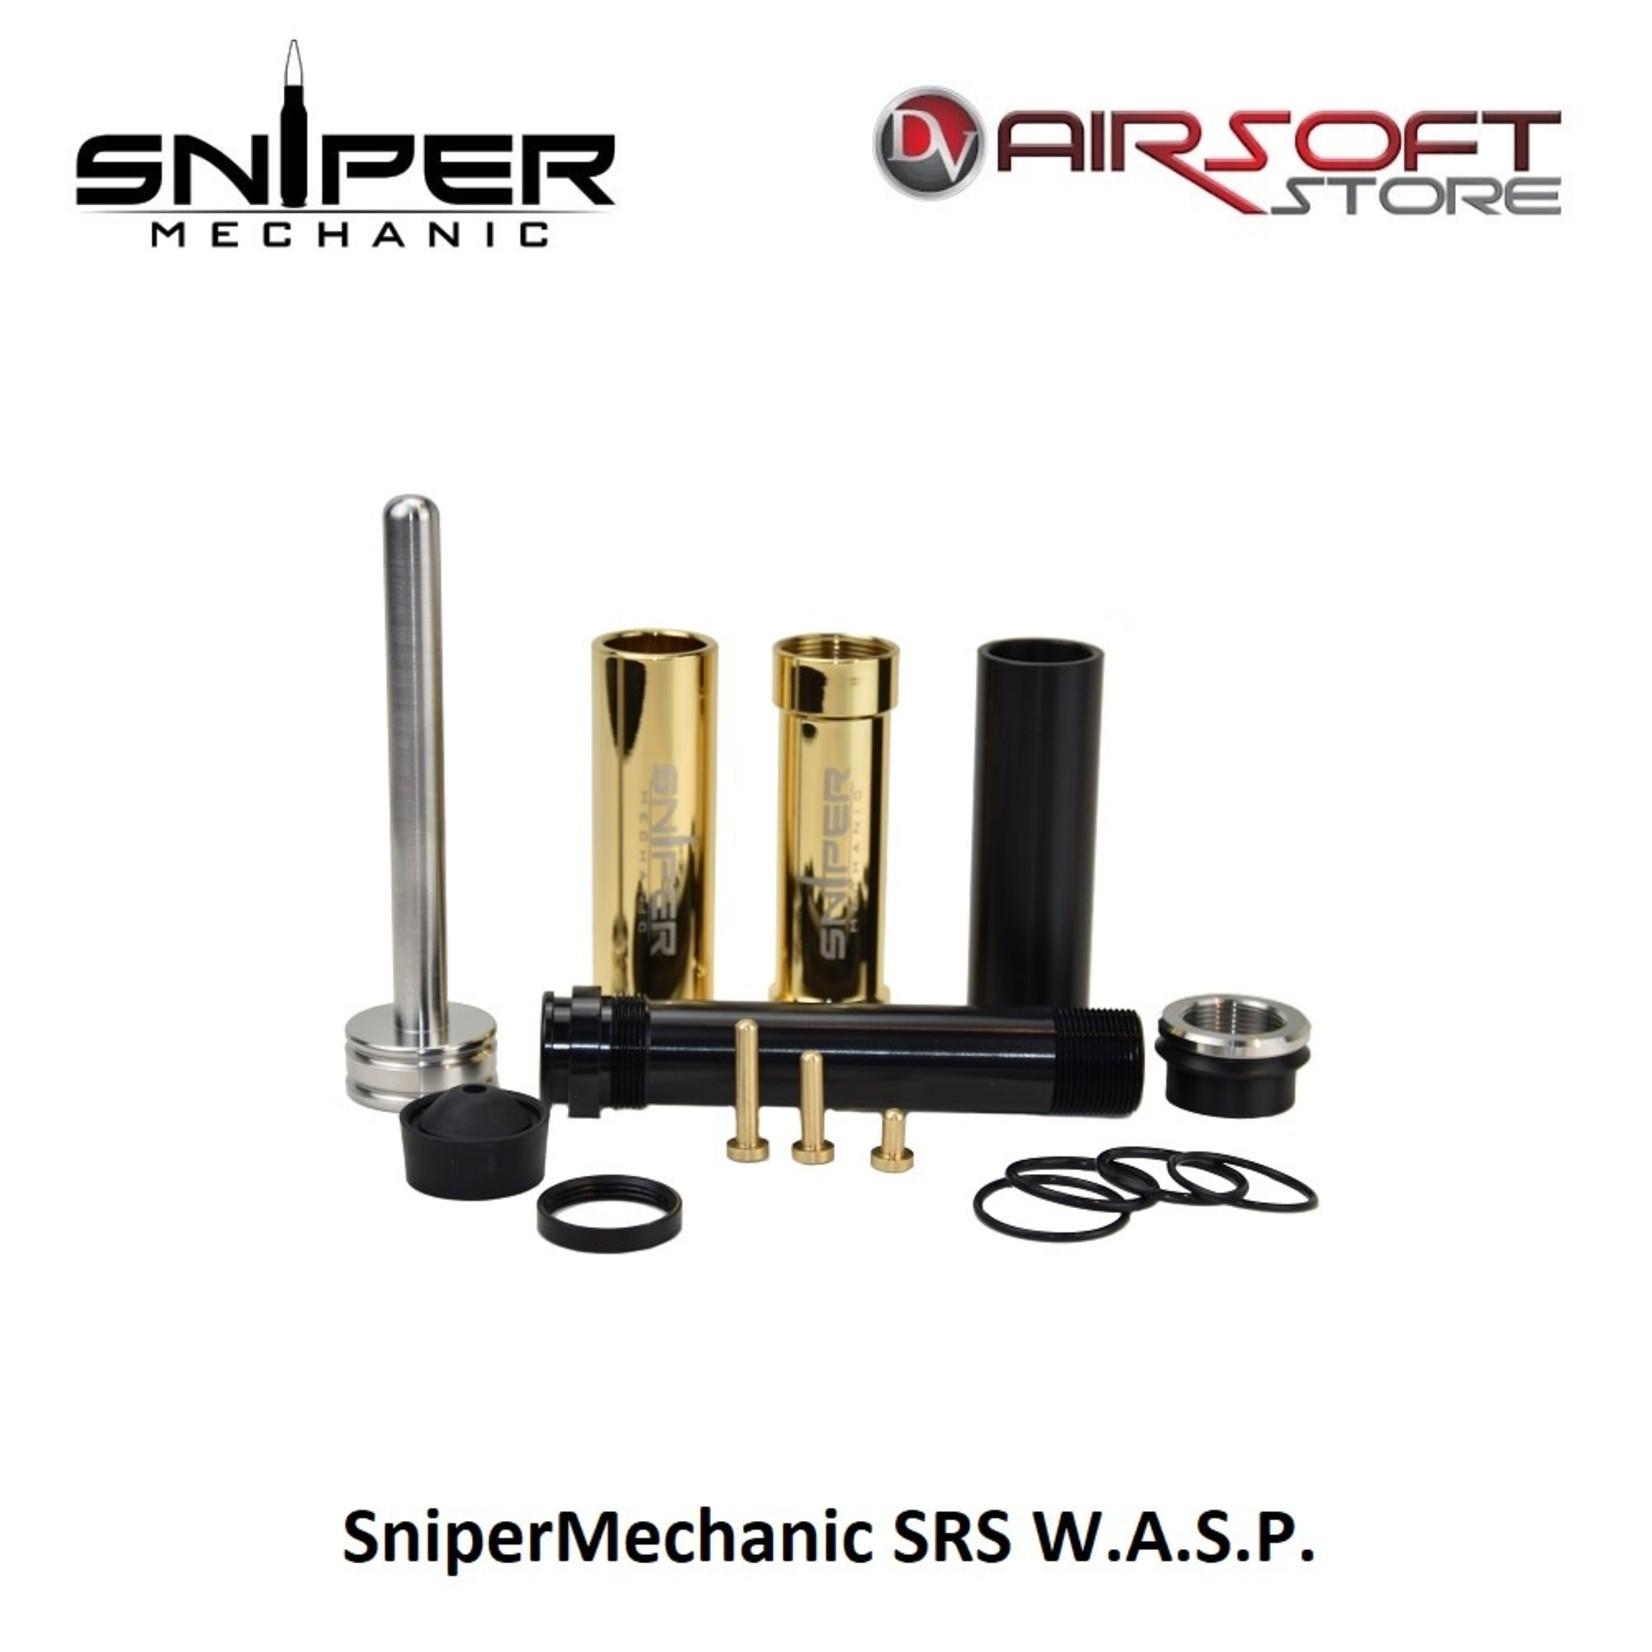 SniperMechanics SRS W.A.S.P.